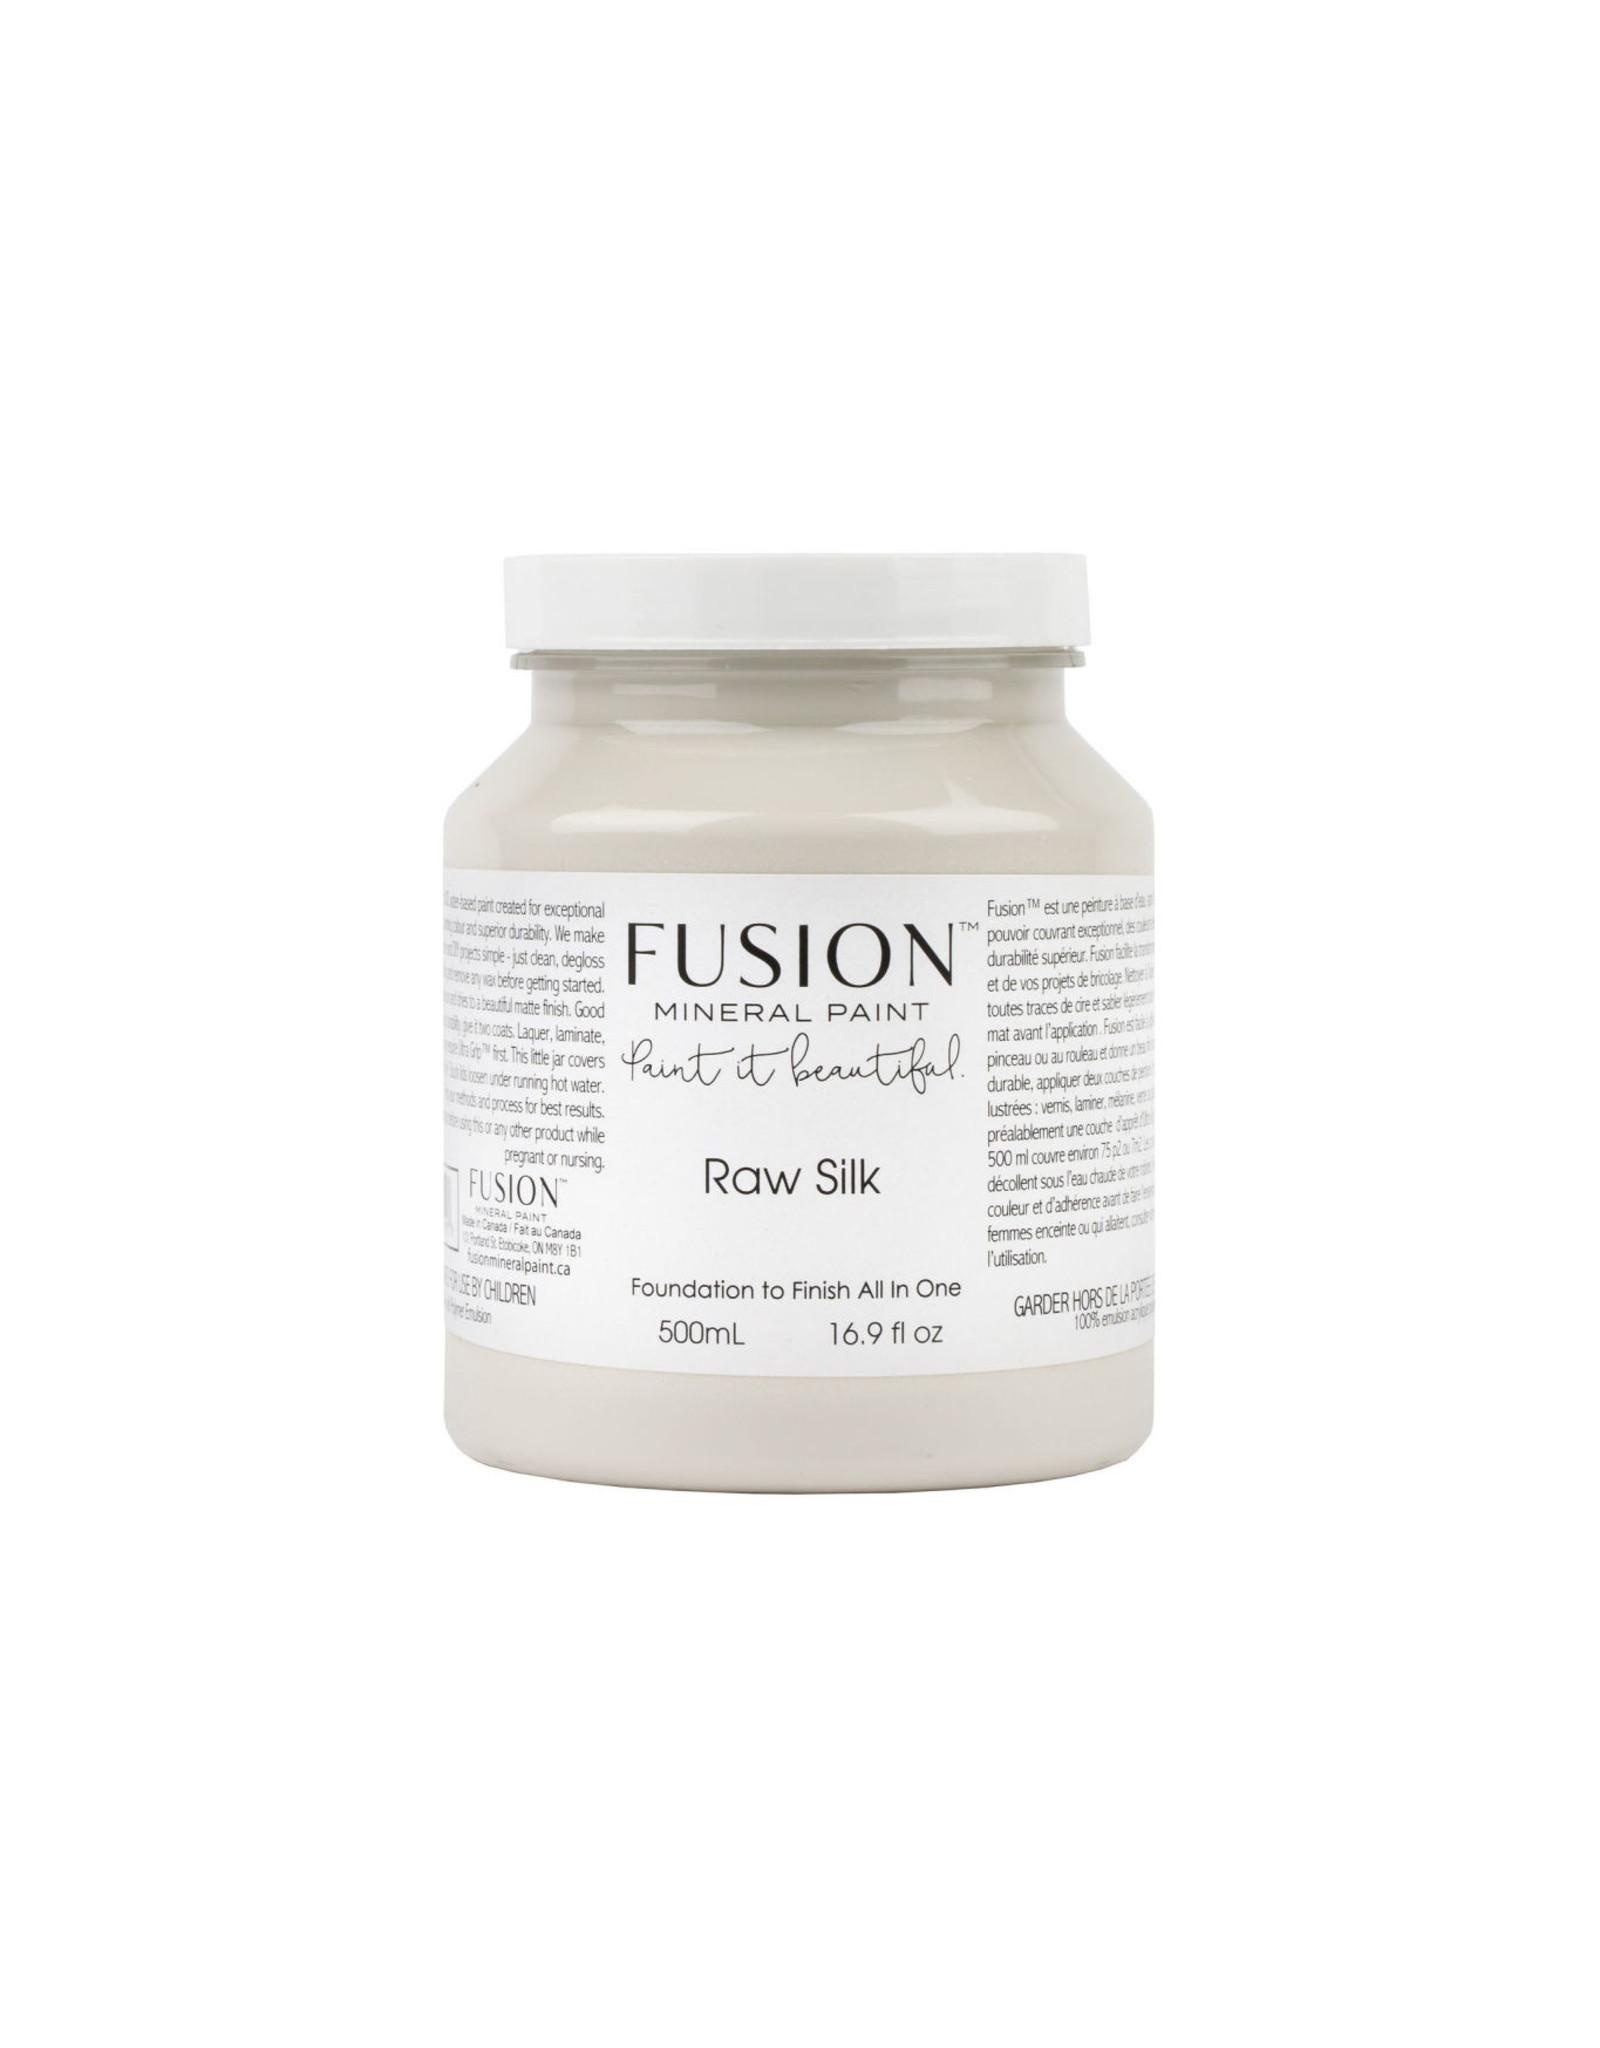 Fusion Mineral Paint Fusion Mineral Paint - Raw Silk 500ml